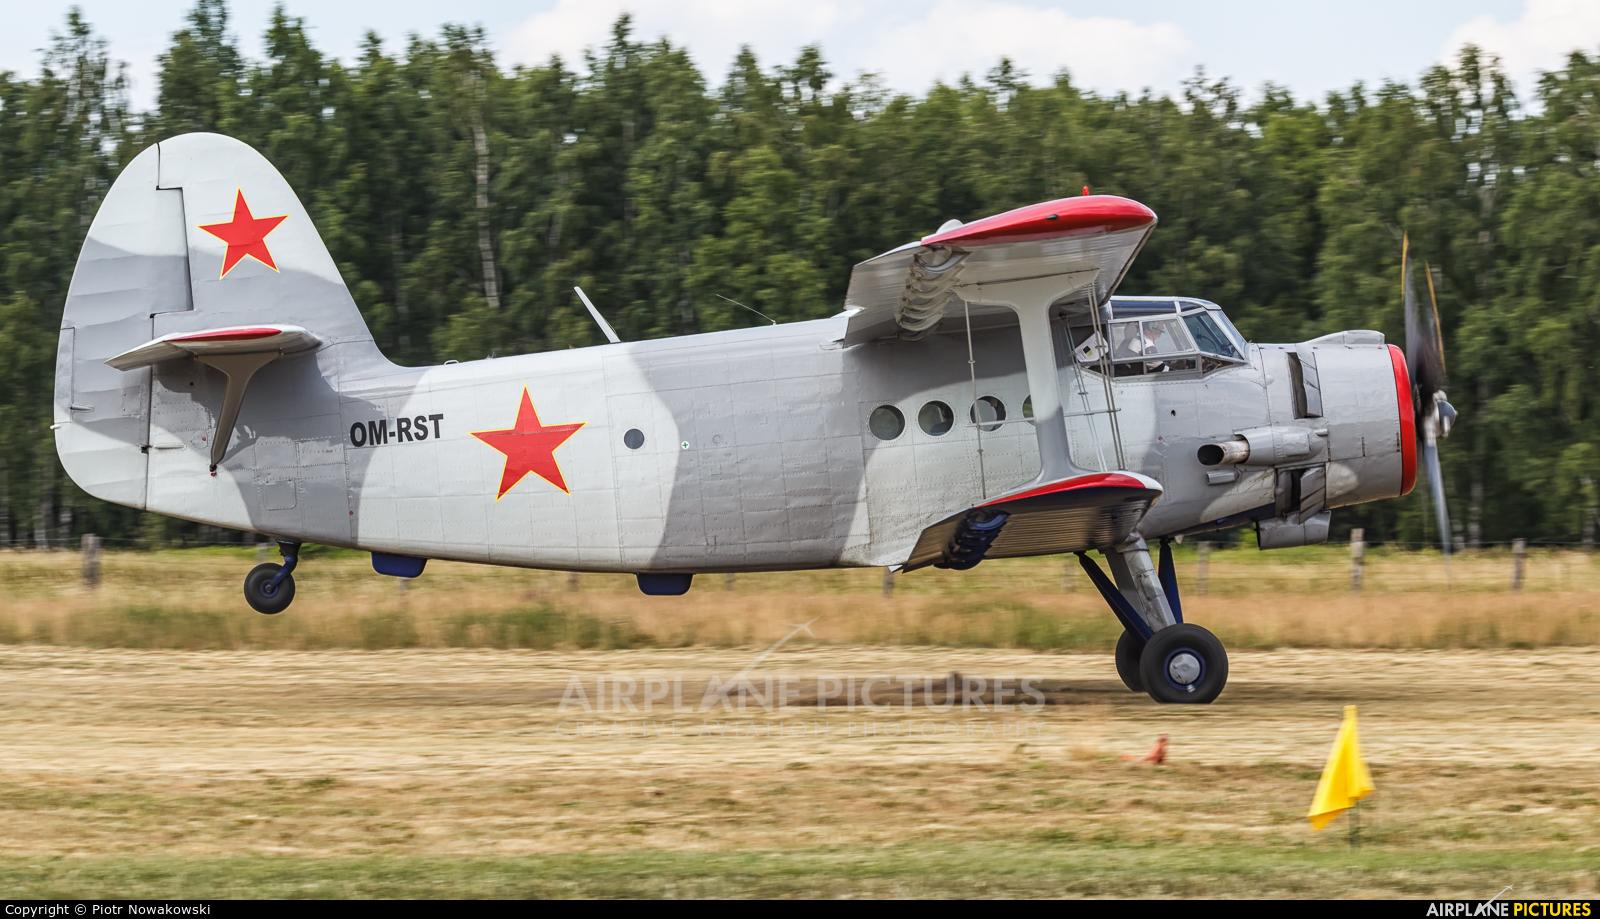 Aeroklub Kosice OM-RST aircraft at Sobienie Królewskie